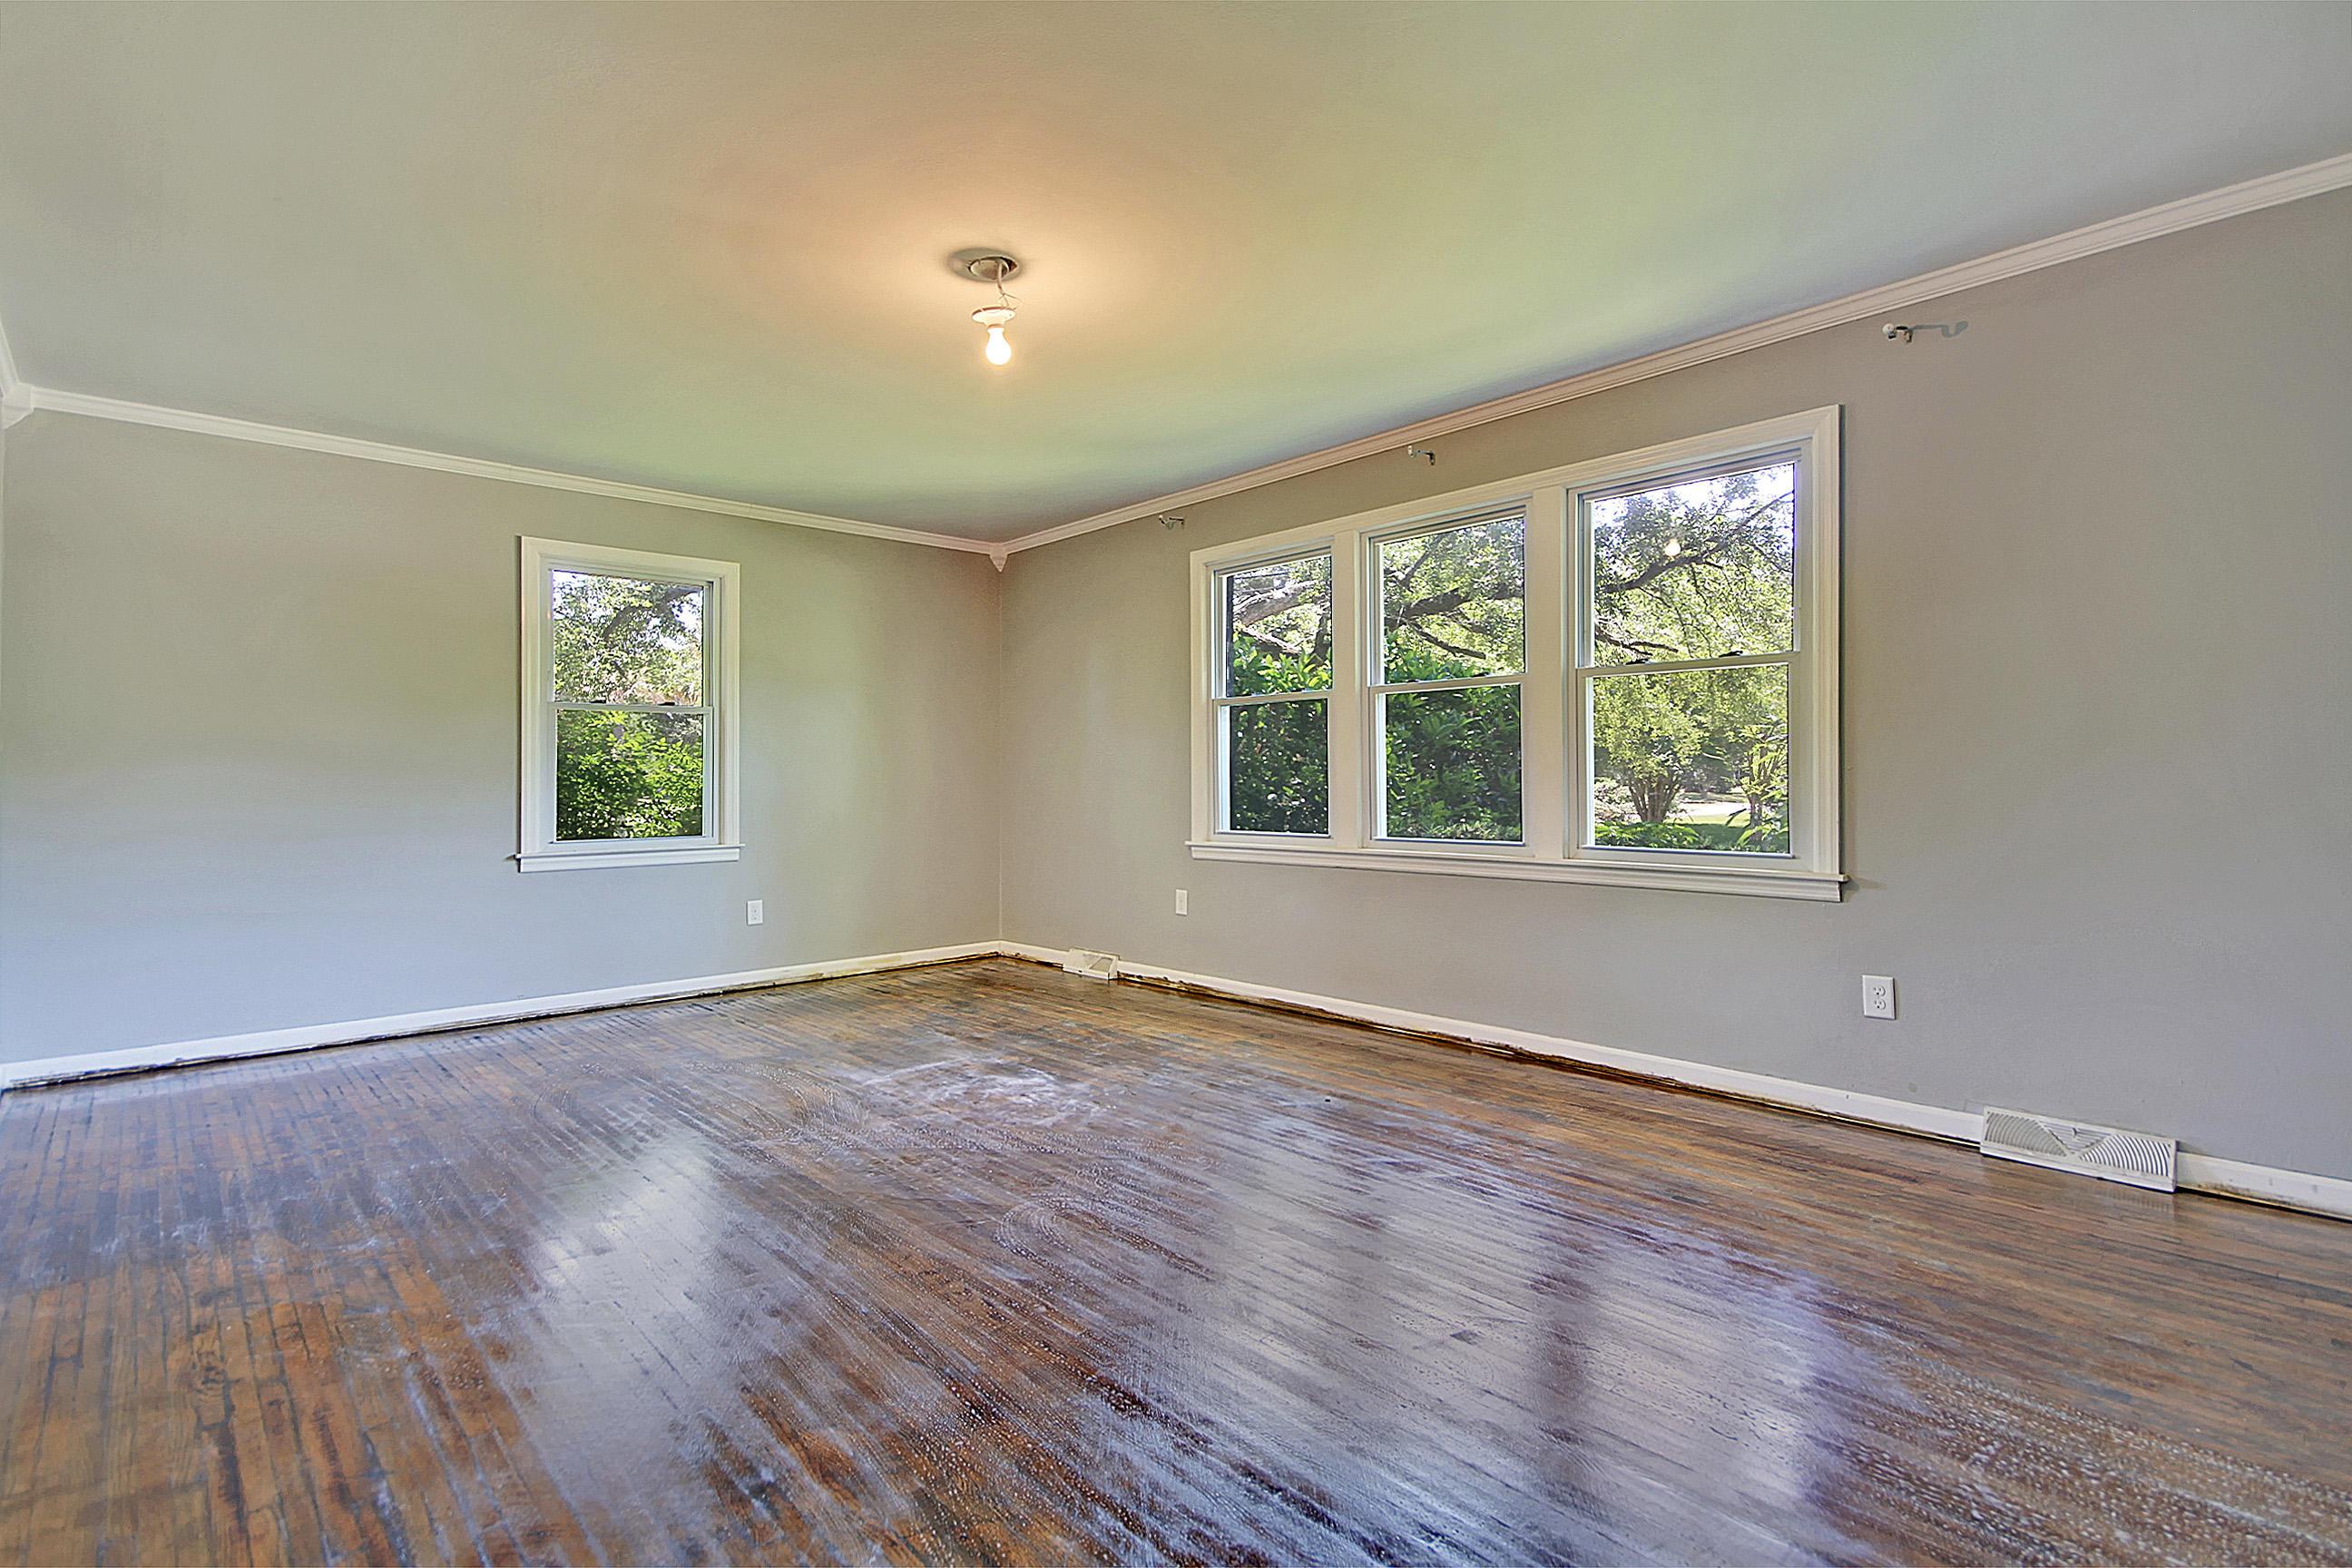 Northbridge Terrace Homes For Sale - 1094 Northbridge, Charleston, SC - 25